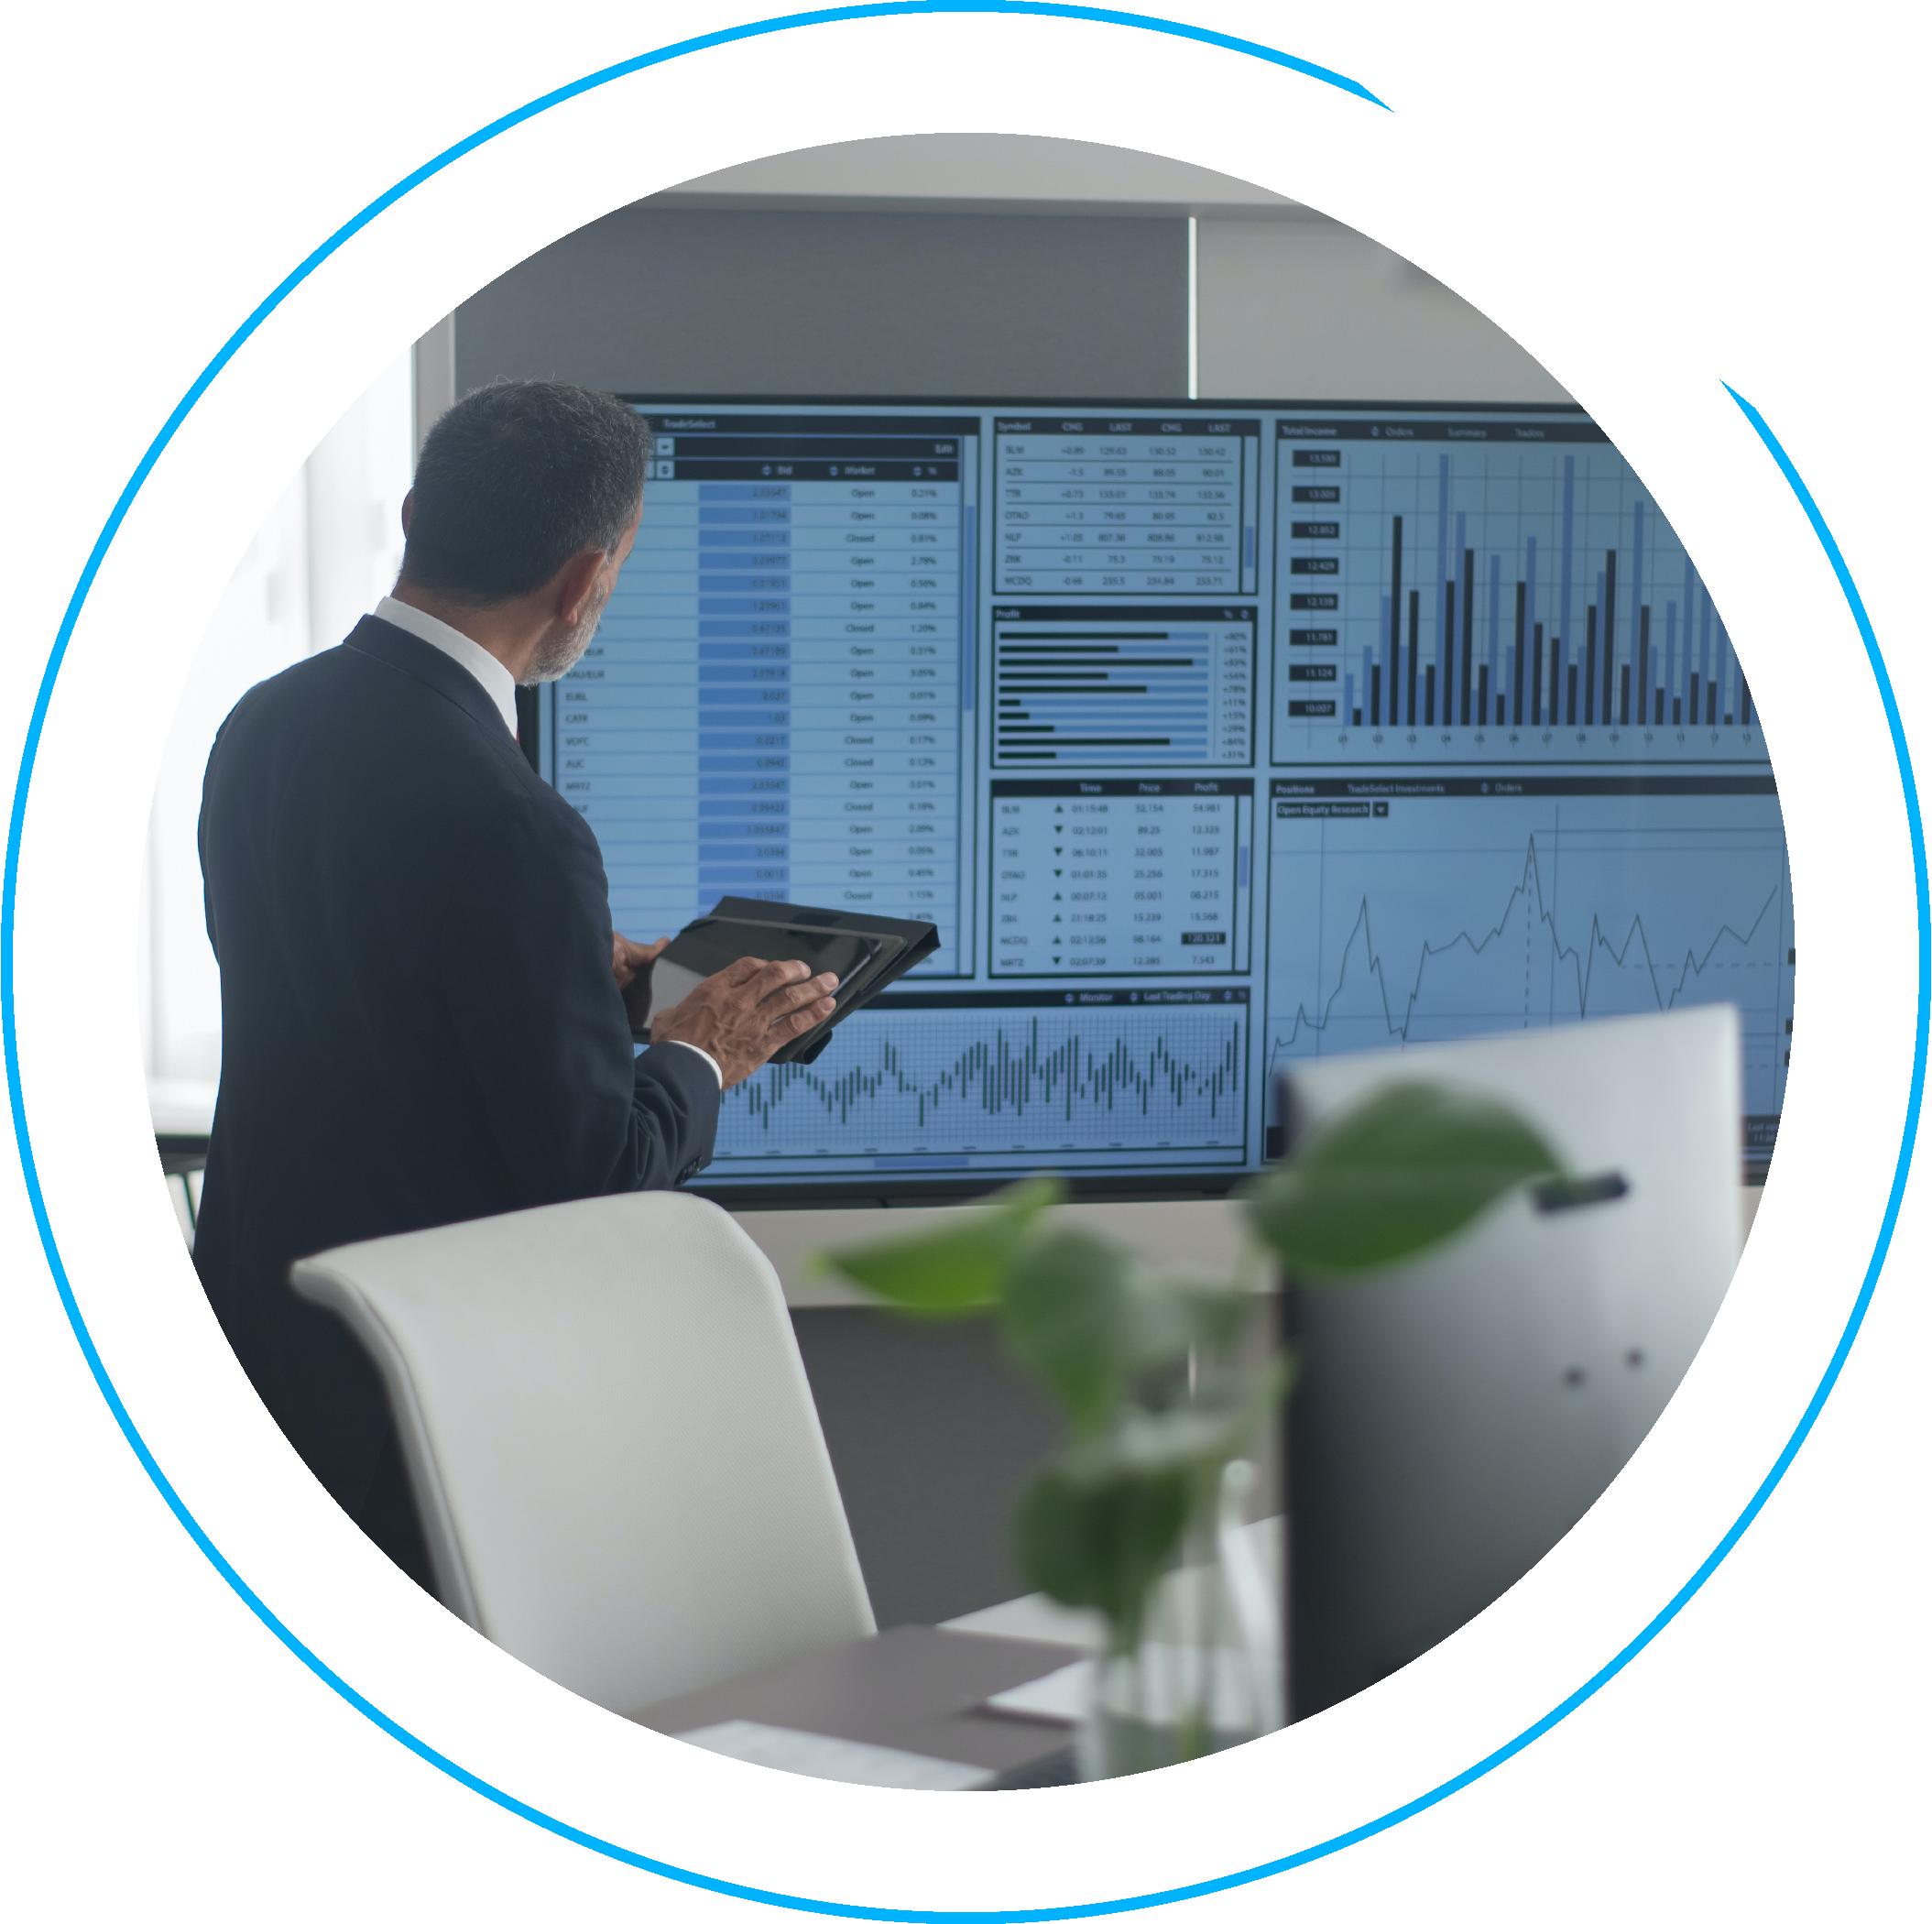 Circulo Data Center_Correo Seguro - Seguridad Cloud (Verne Group)